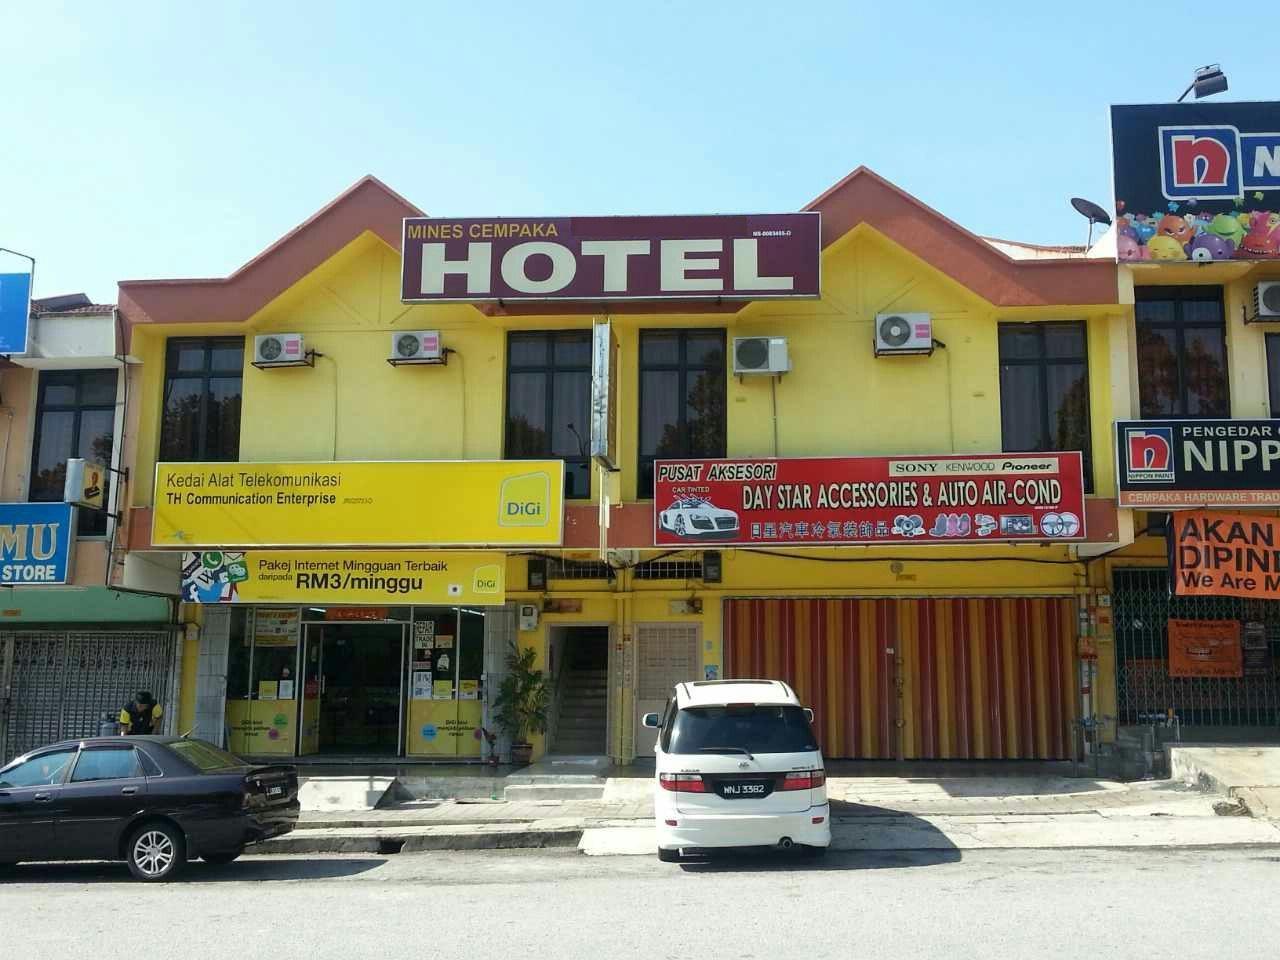 Mines Cempaka Hotel, Seremban